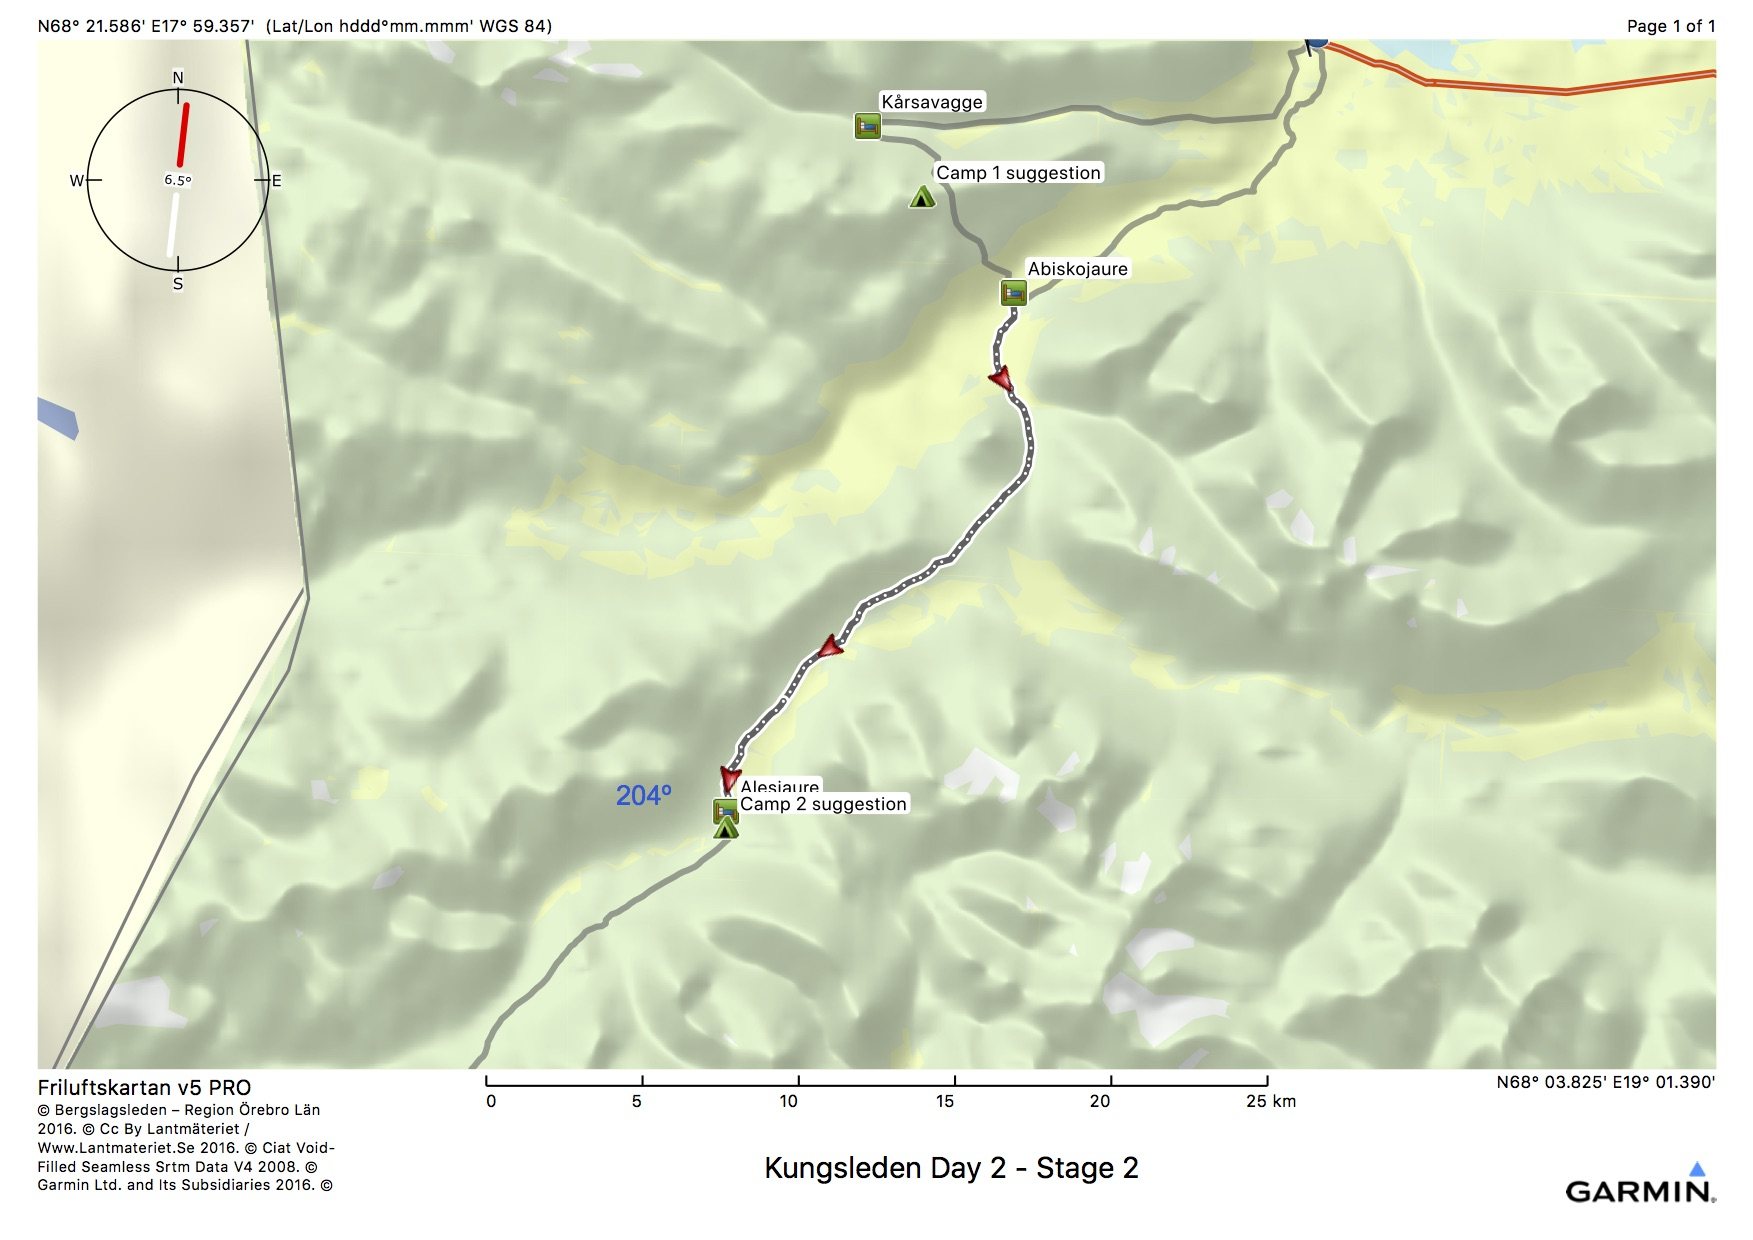 Kungsleden Day 2 - Stage 2